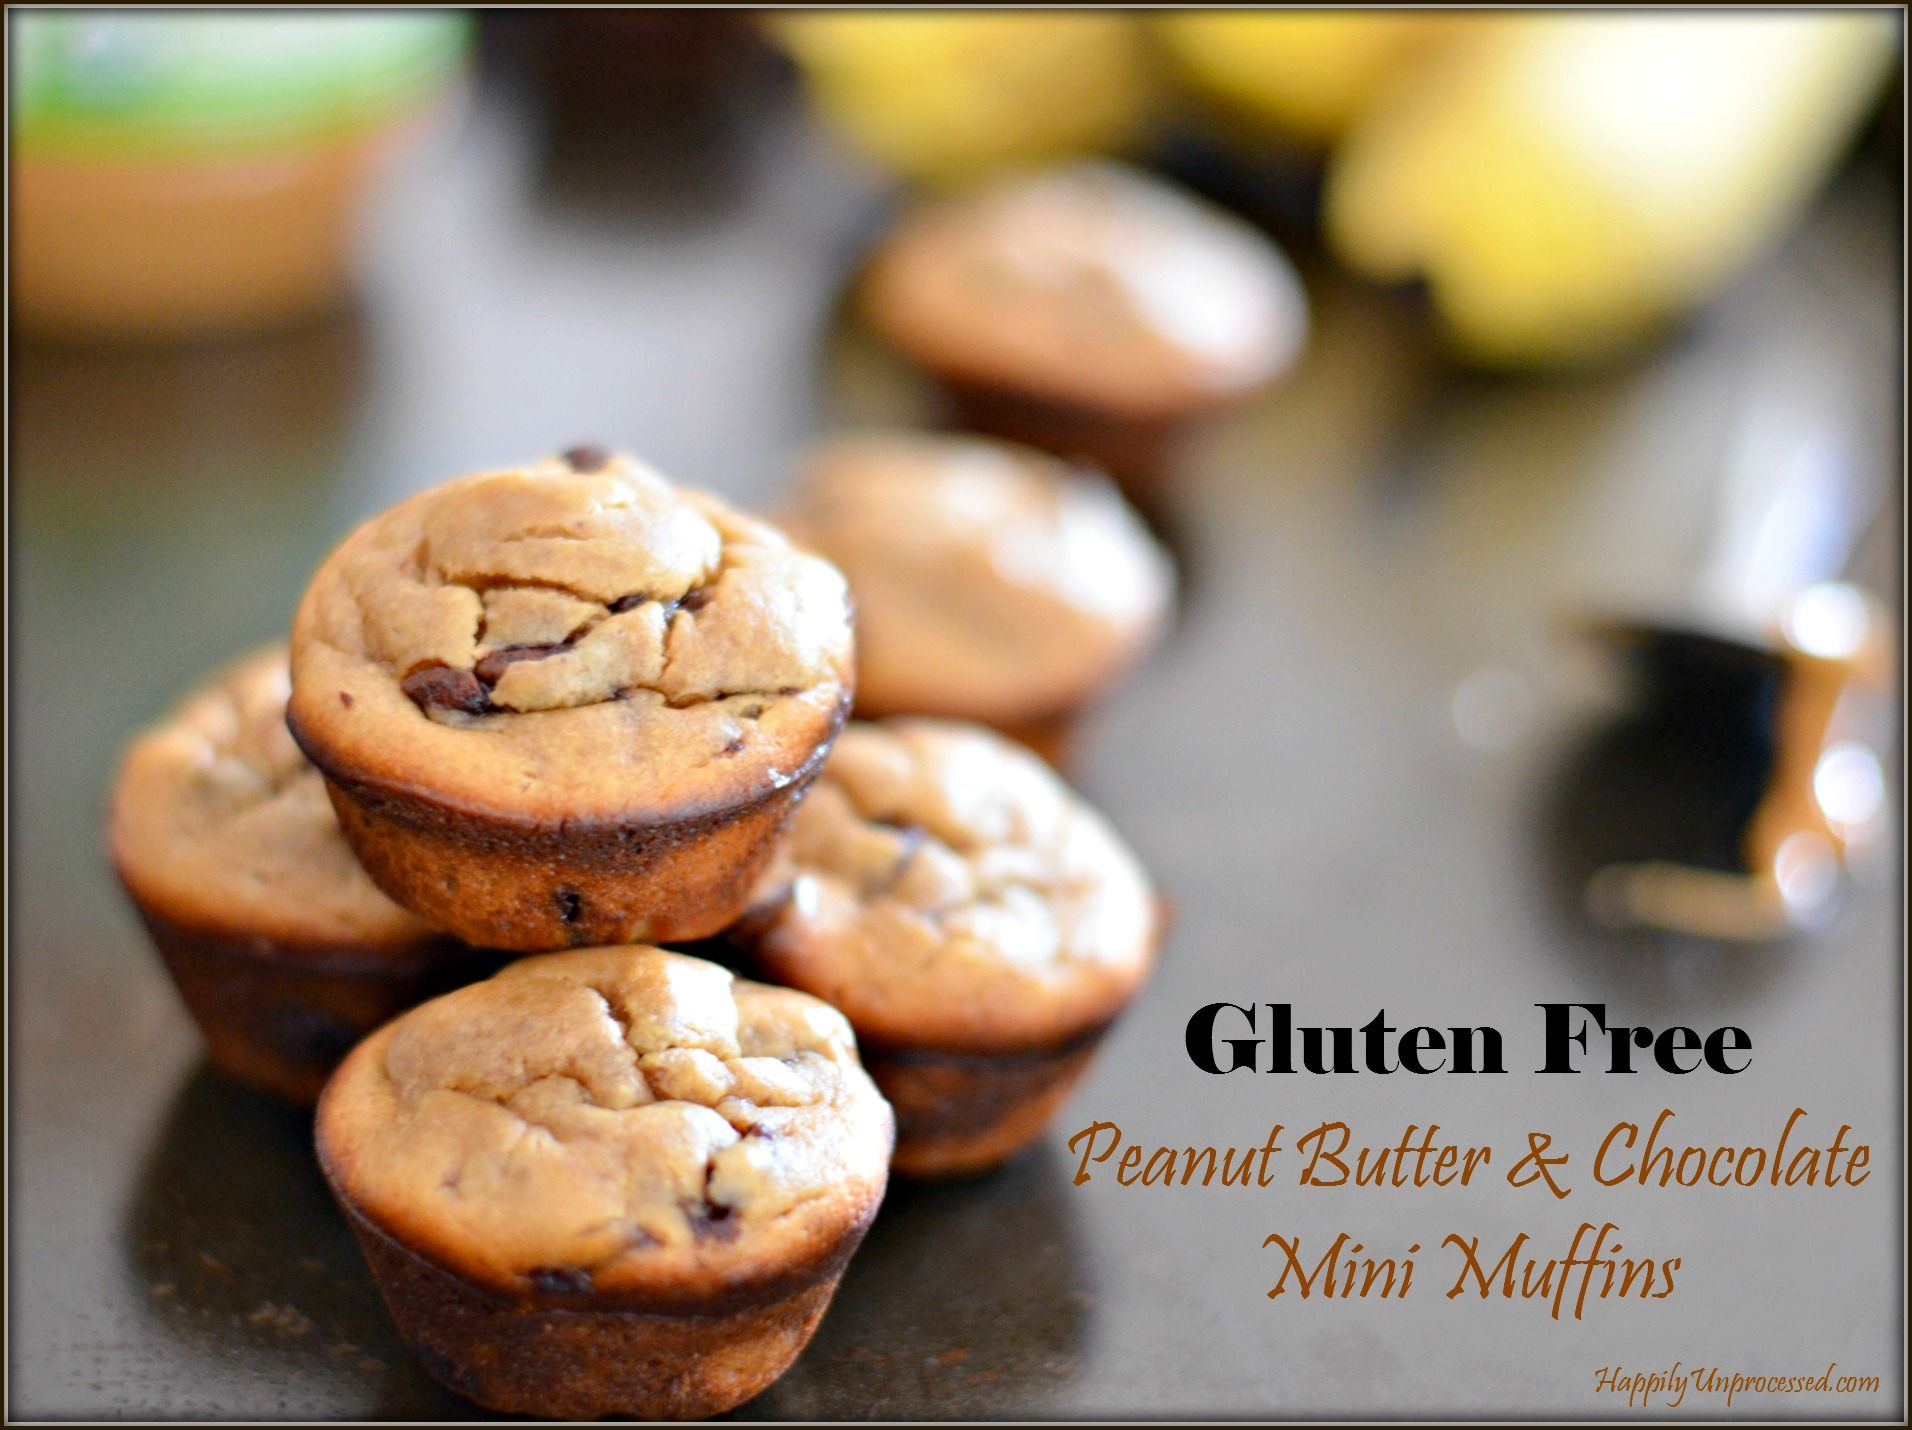 flourless peanut butter & chocolate mini muffins